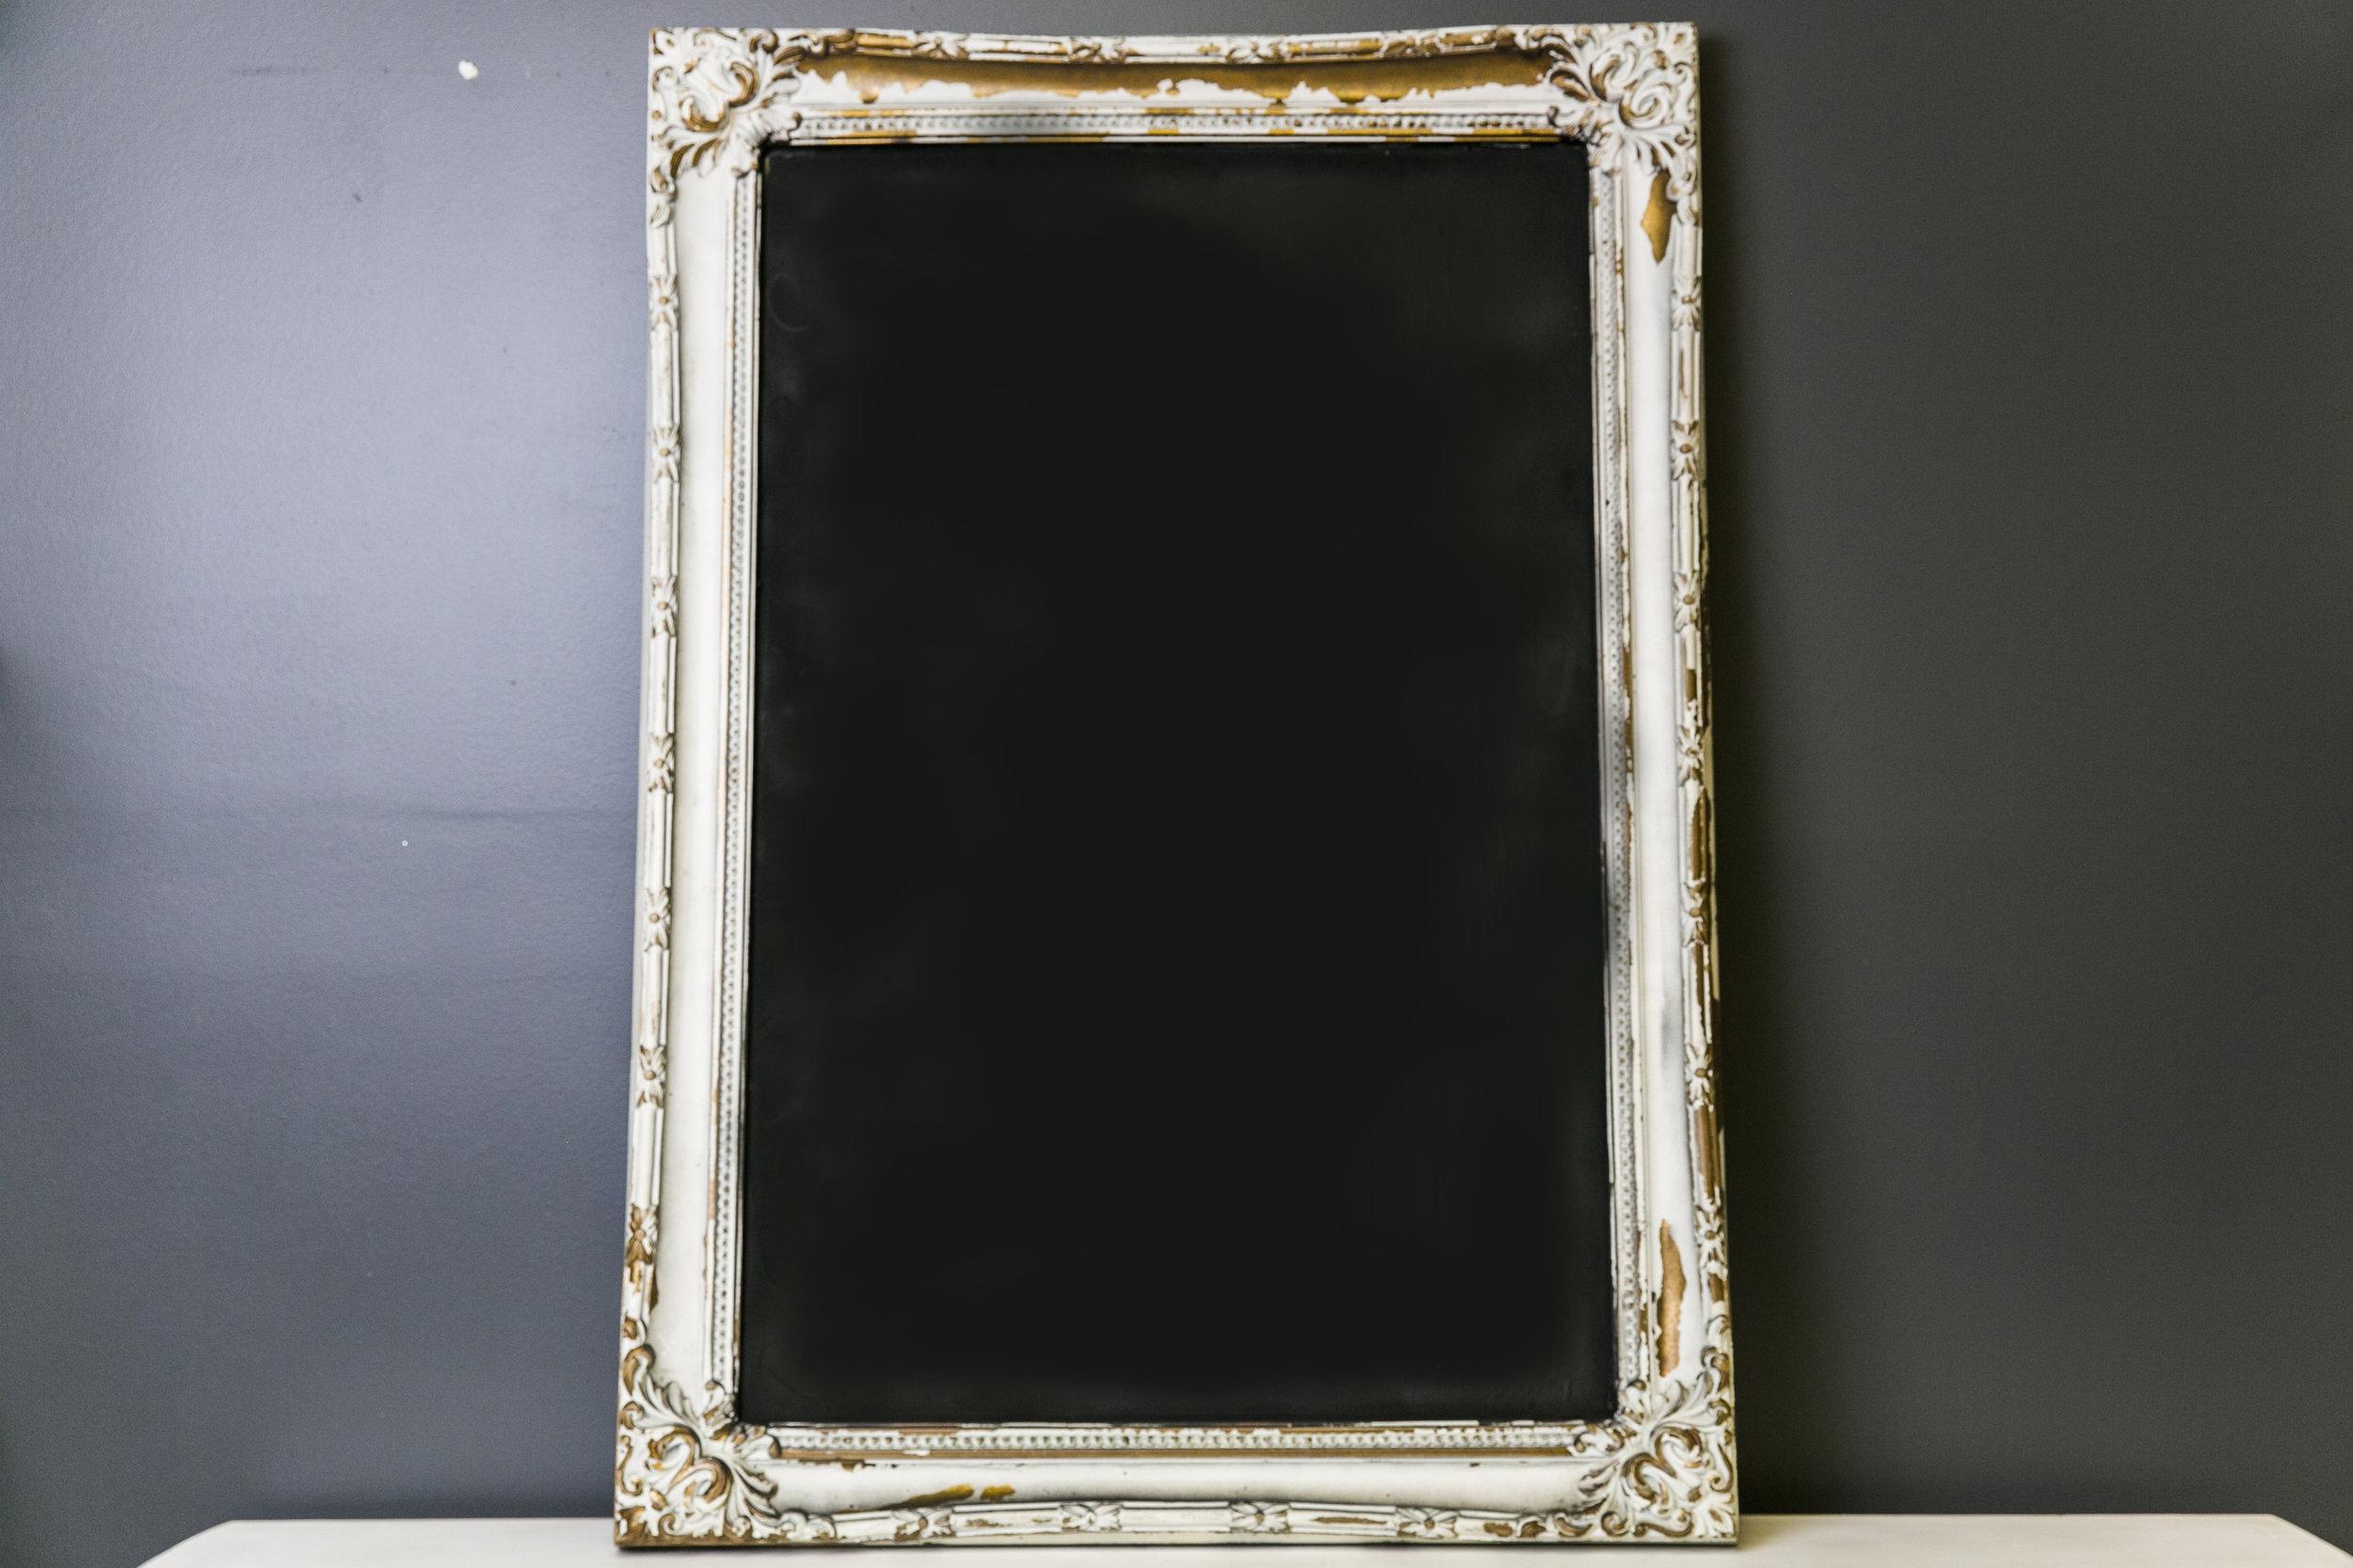 Clementine Chalkboard . 41 x 28